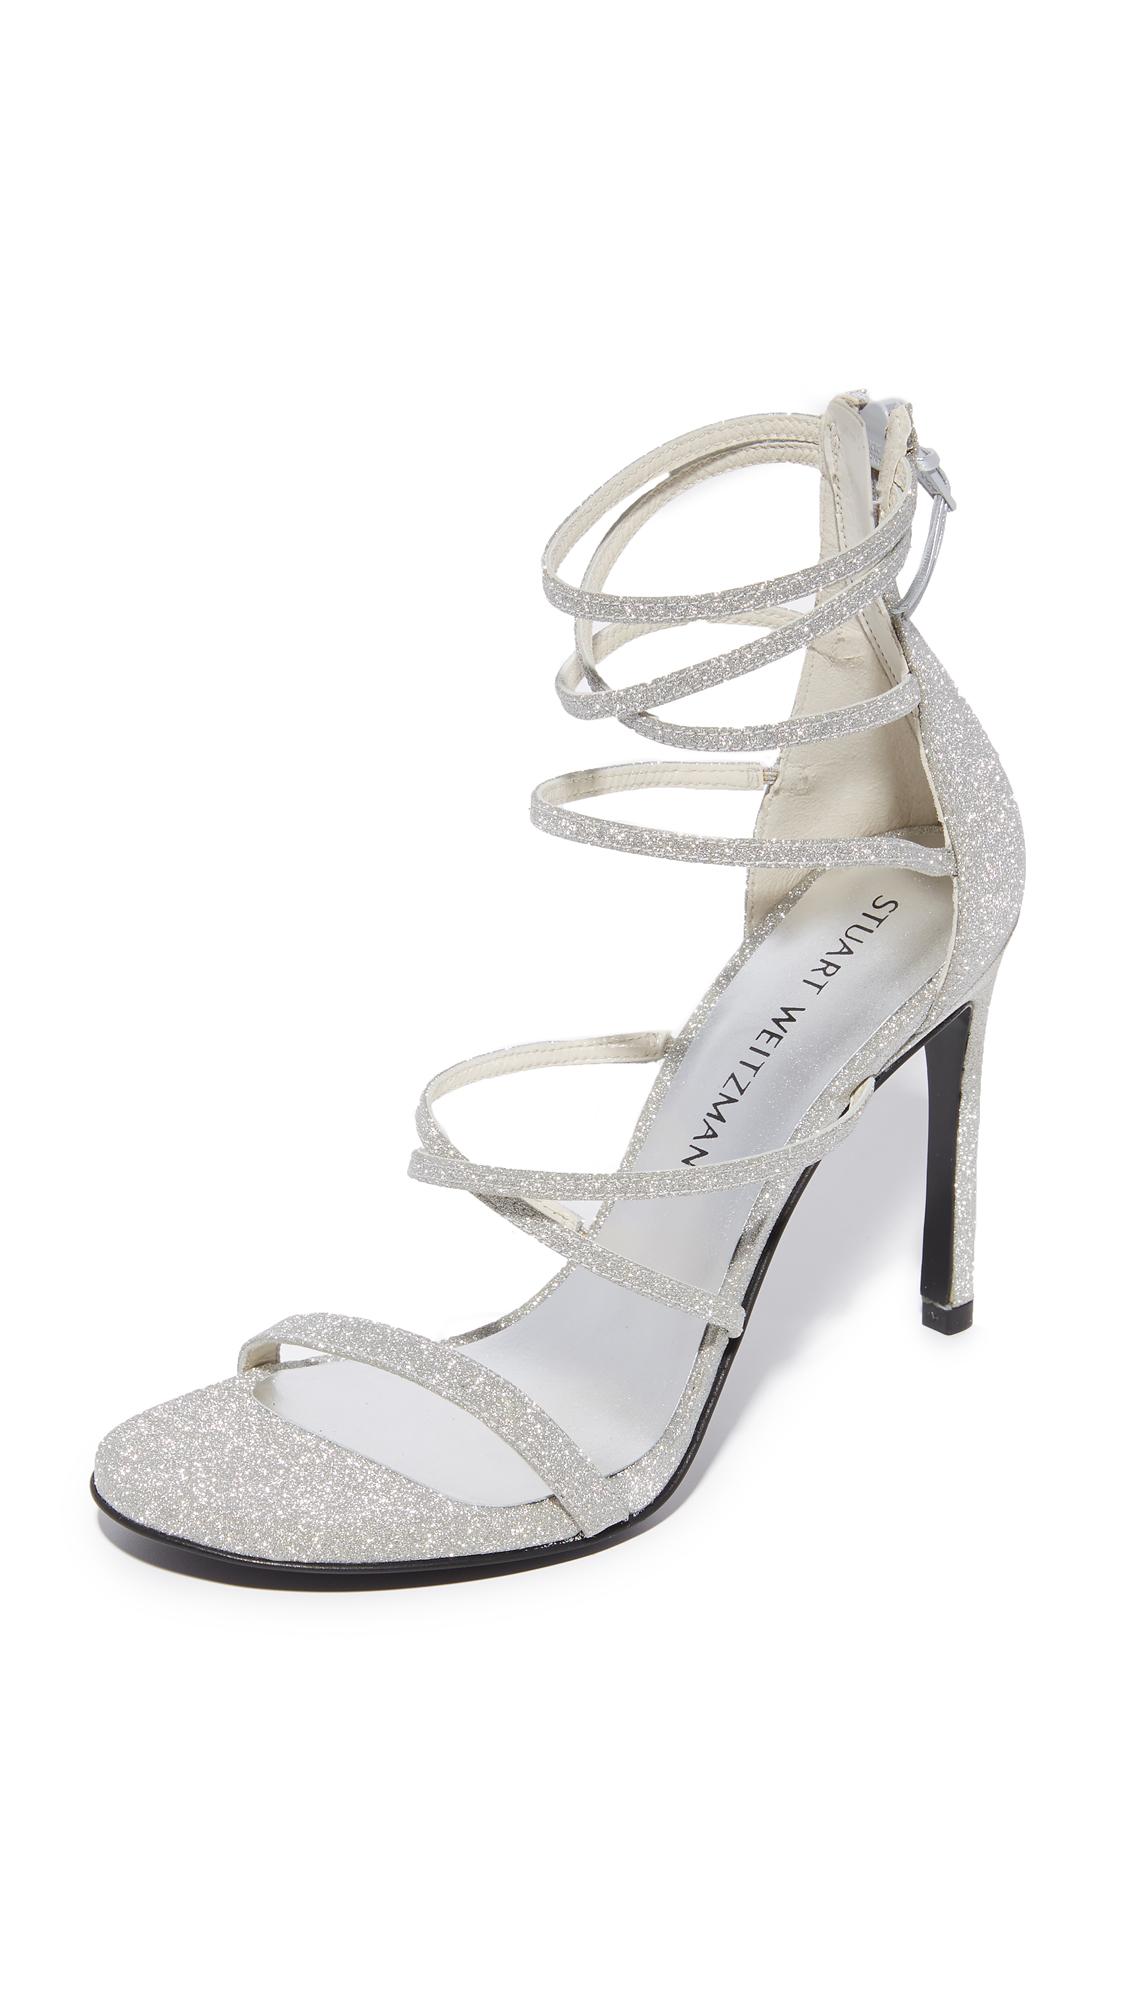 stuart weitzman female  stuart weitzman myex sandals plata